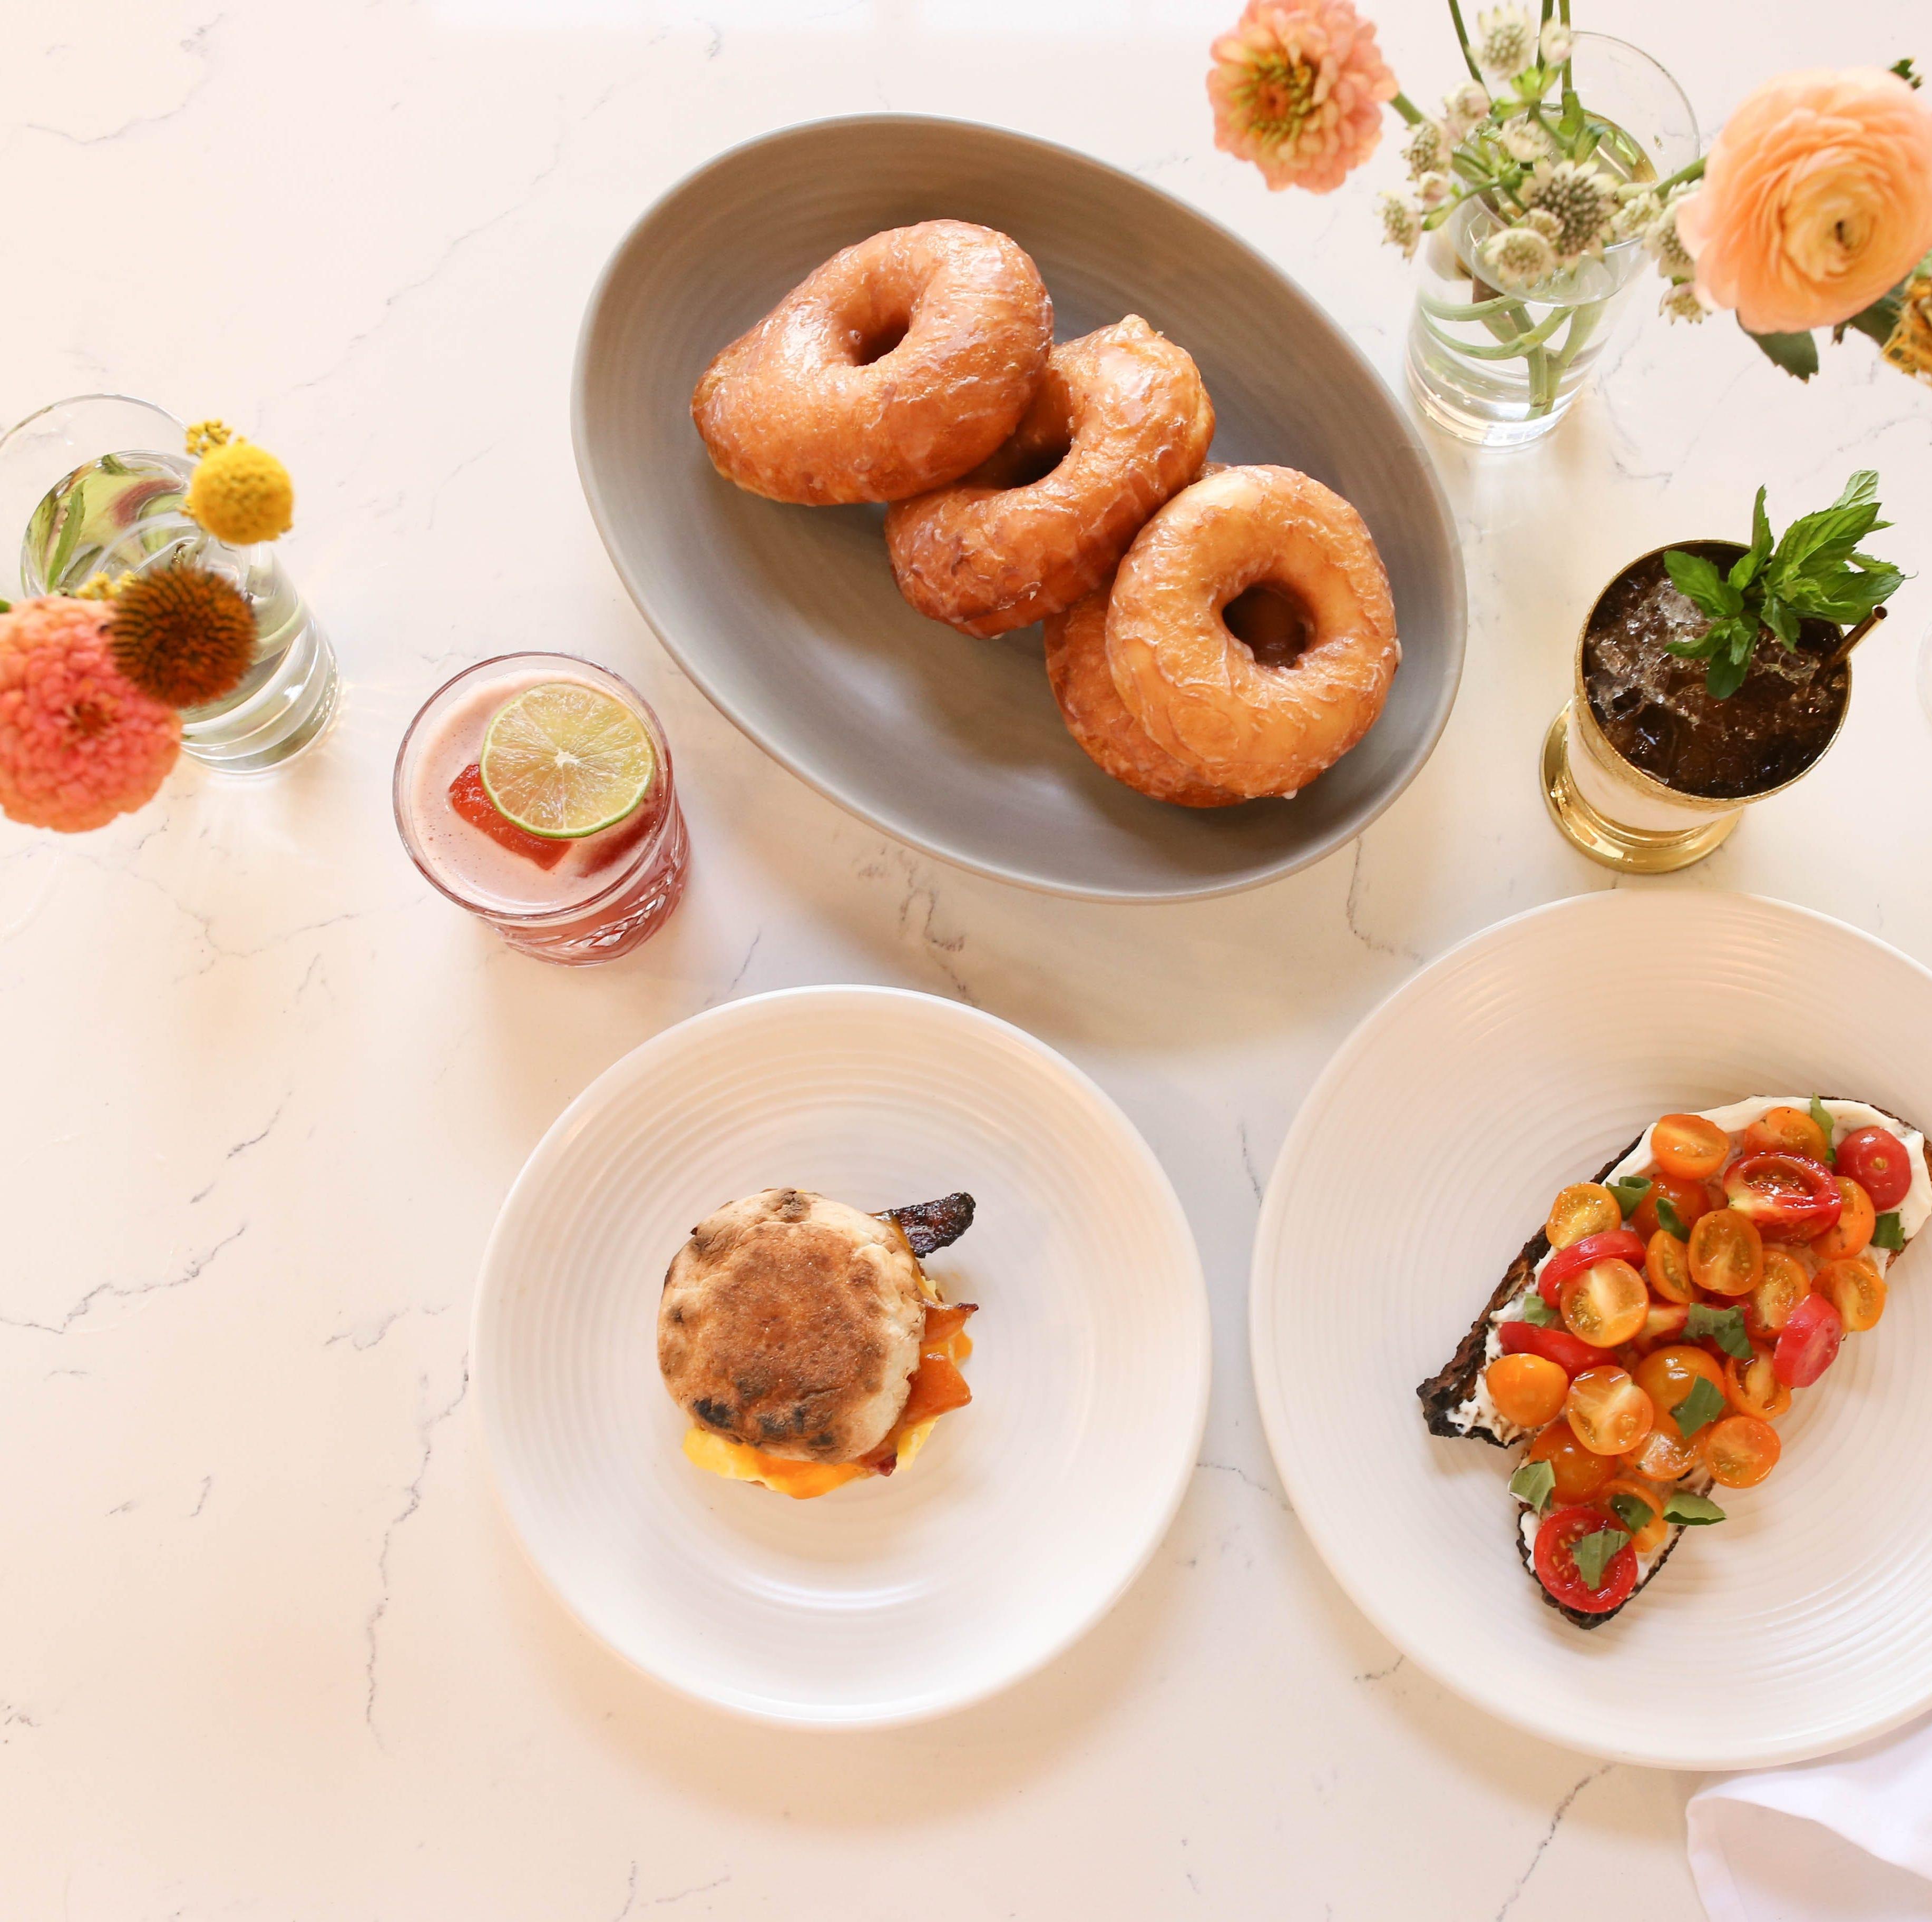 Stay Golden Restaurant & Roastery opens Aug. 14,...